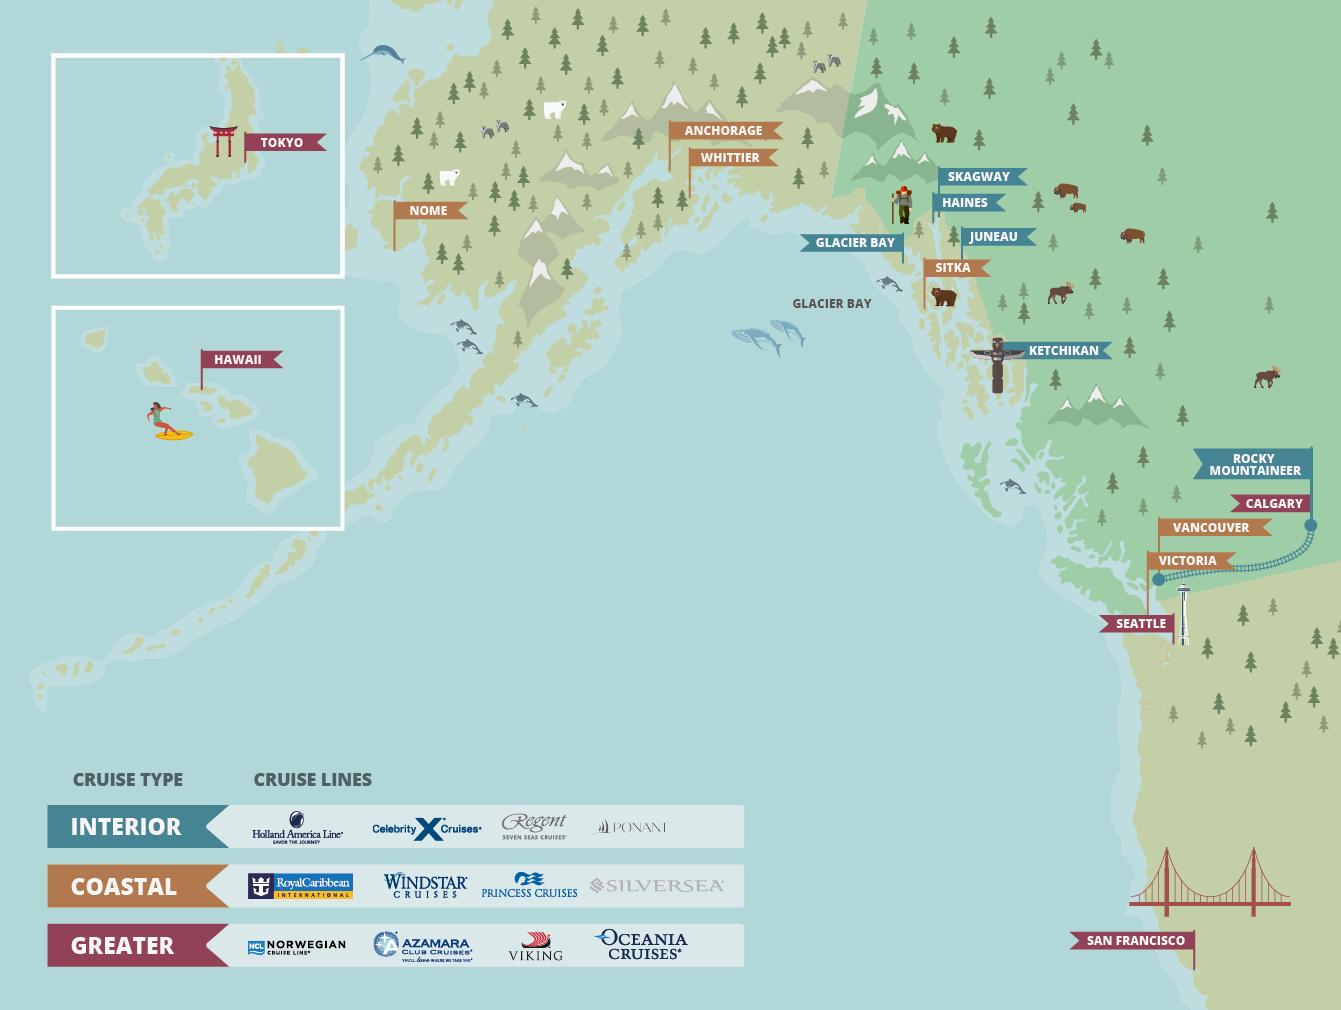 Alaska Cruise Deals | Alaska Cruise Holidays | IgluCruise